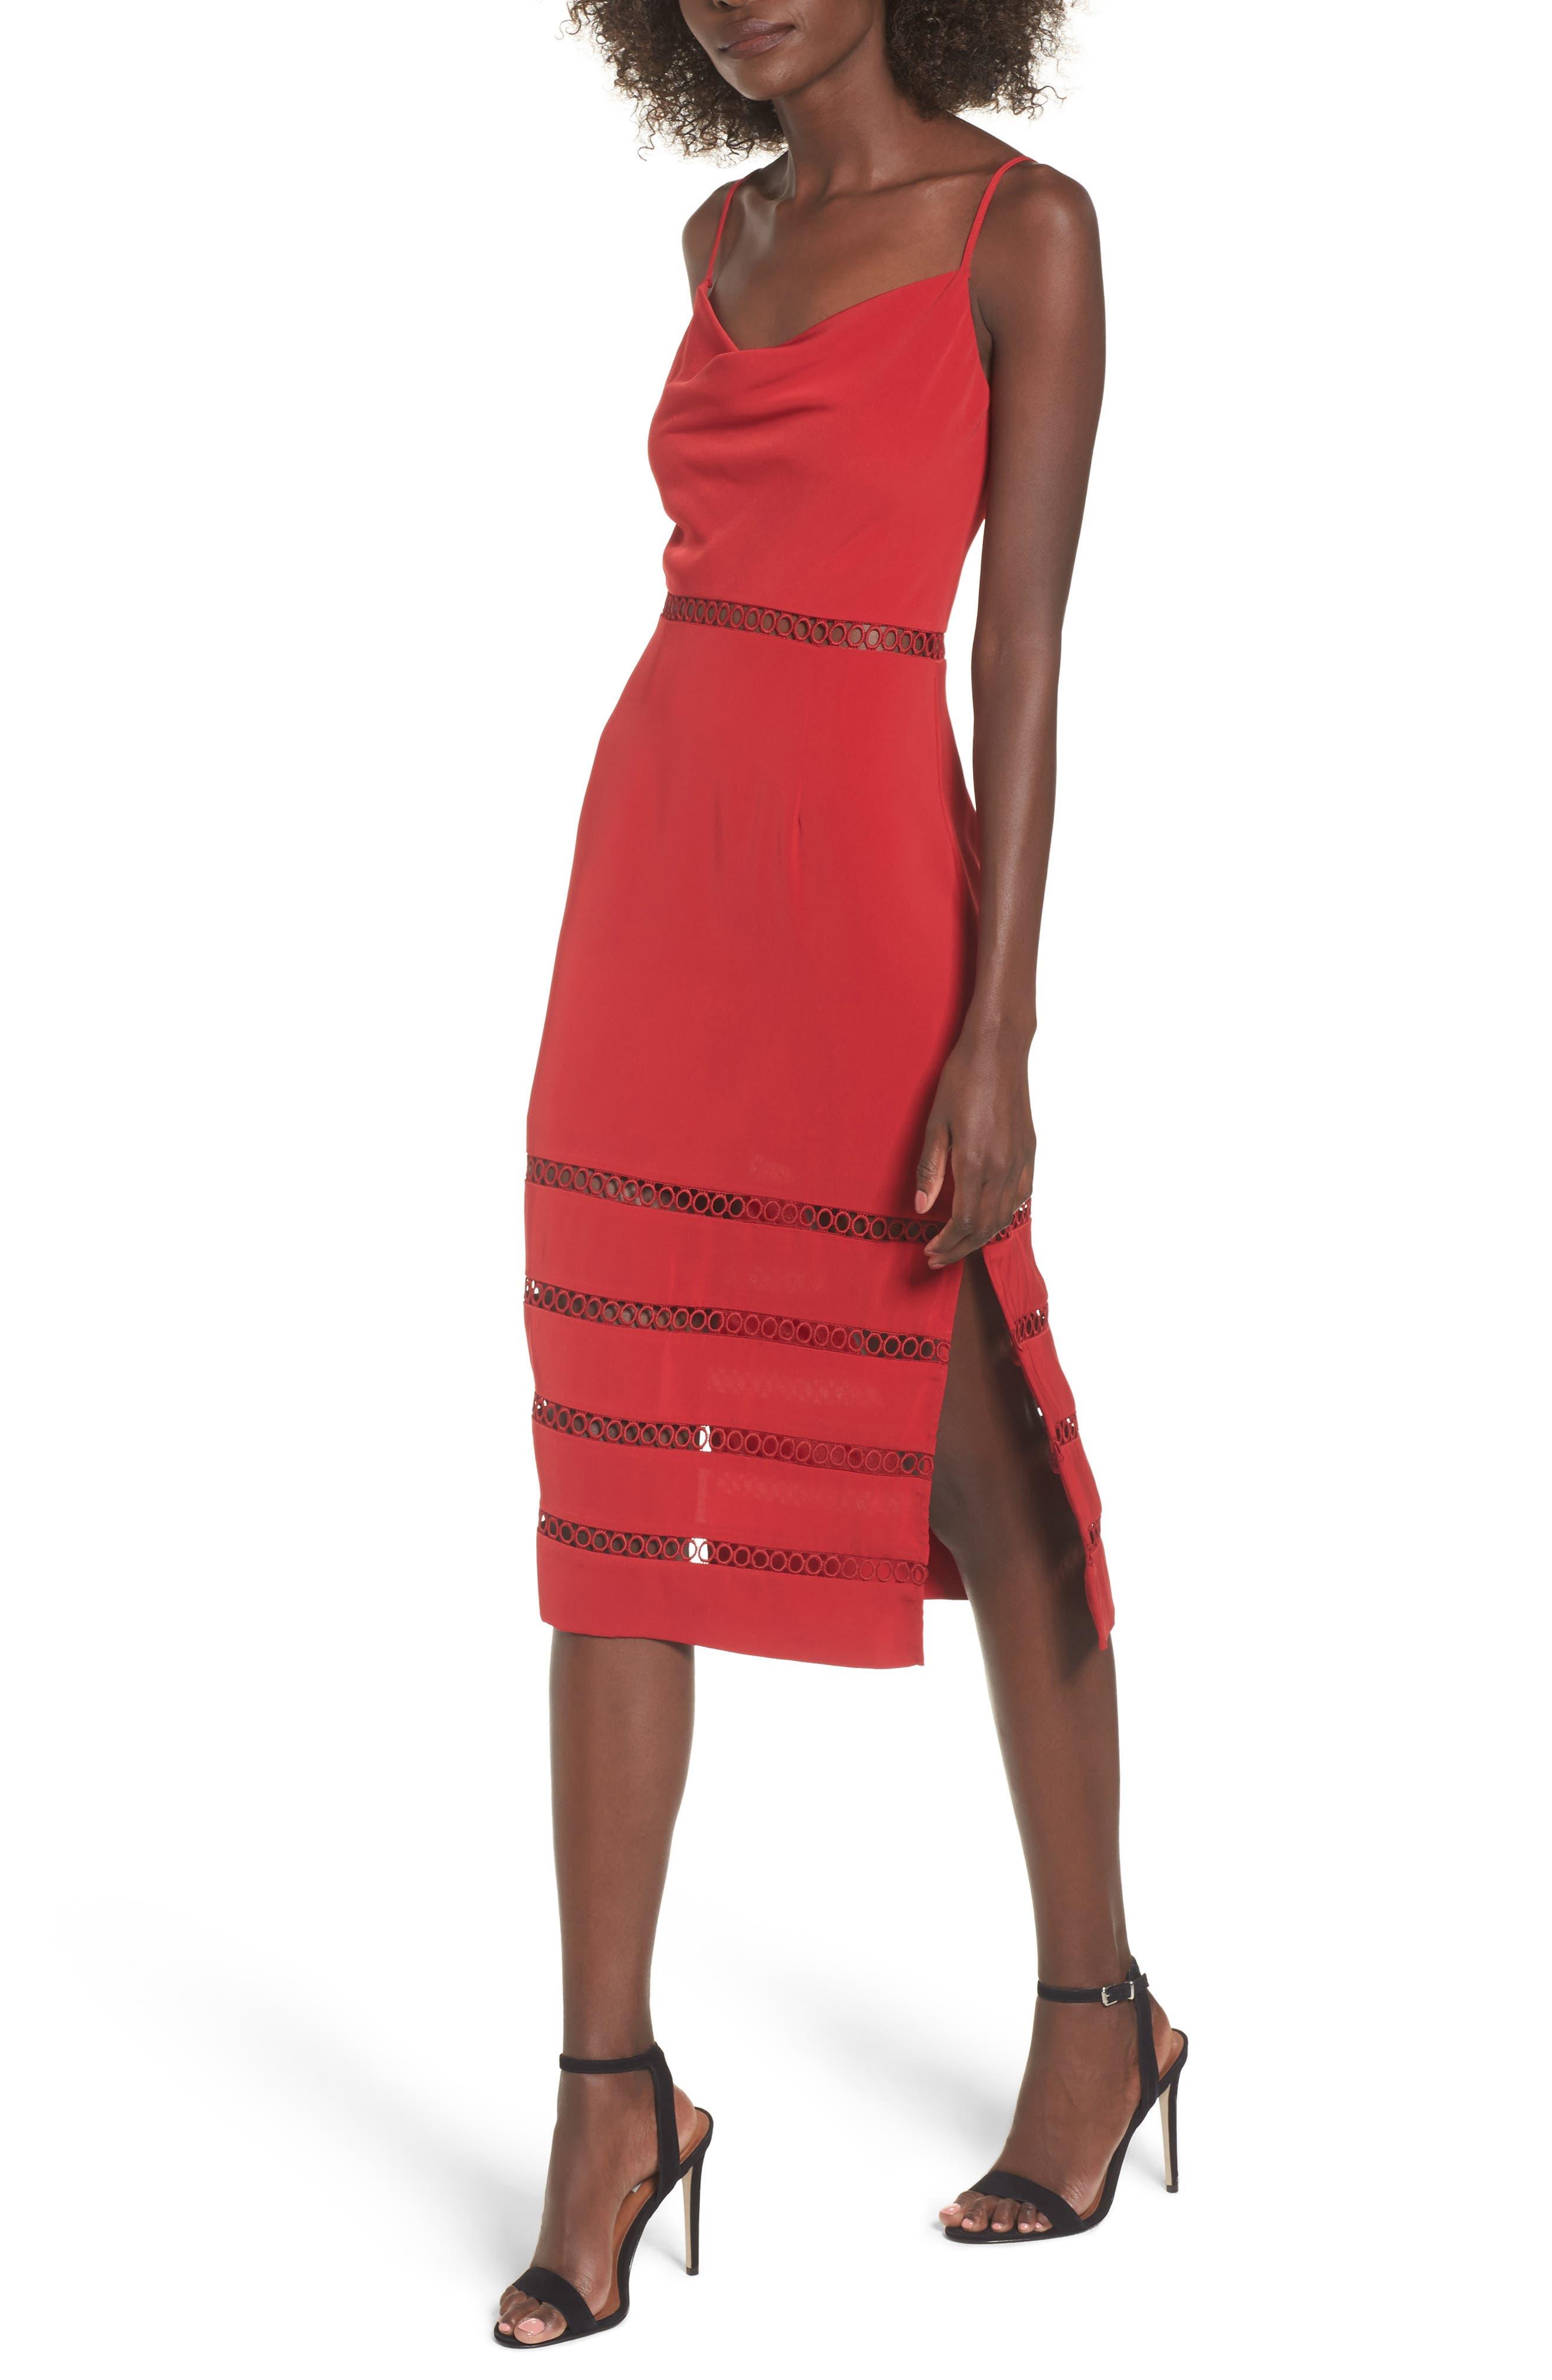 Alternate Image 1 Selected - Keepsake the Label Indugle Cowl Neck Sheath Dress